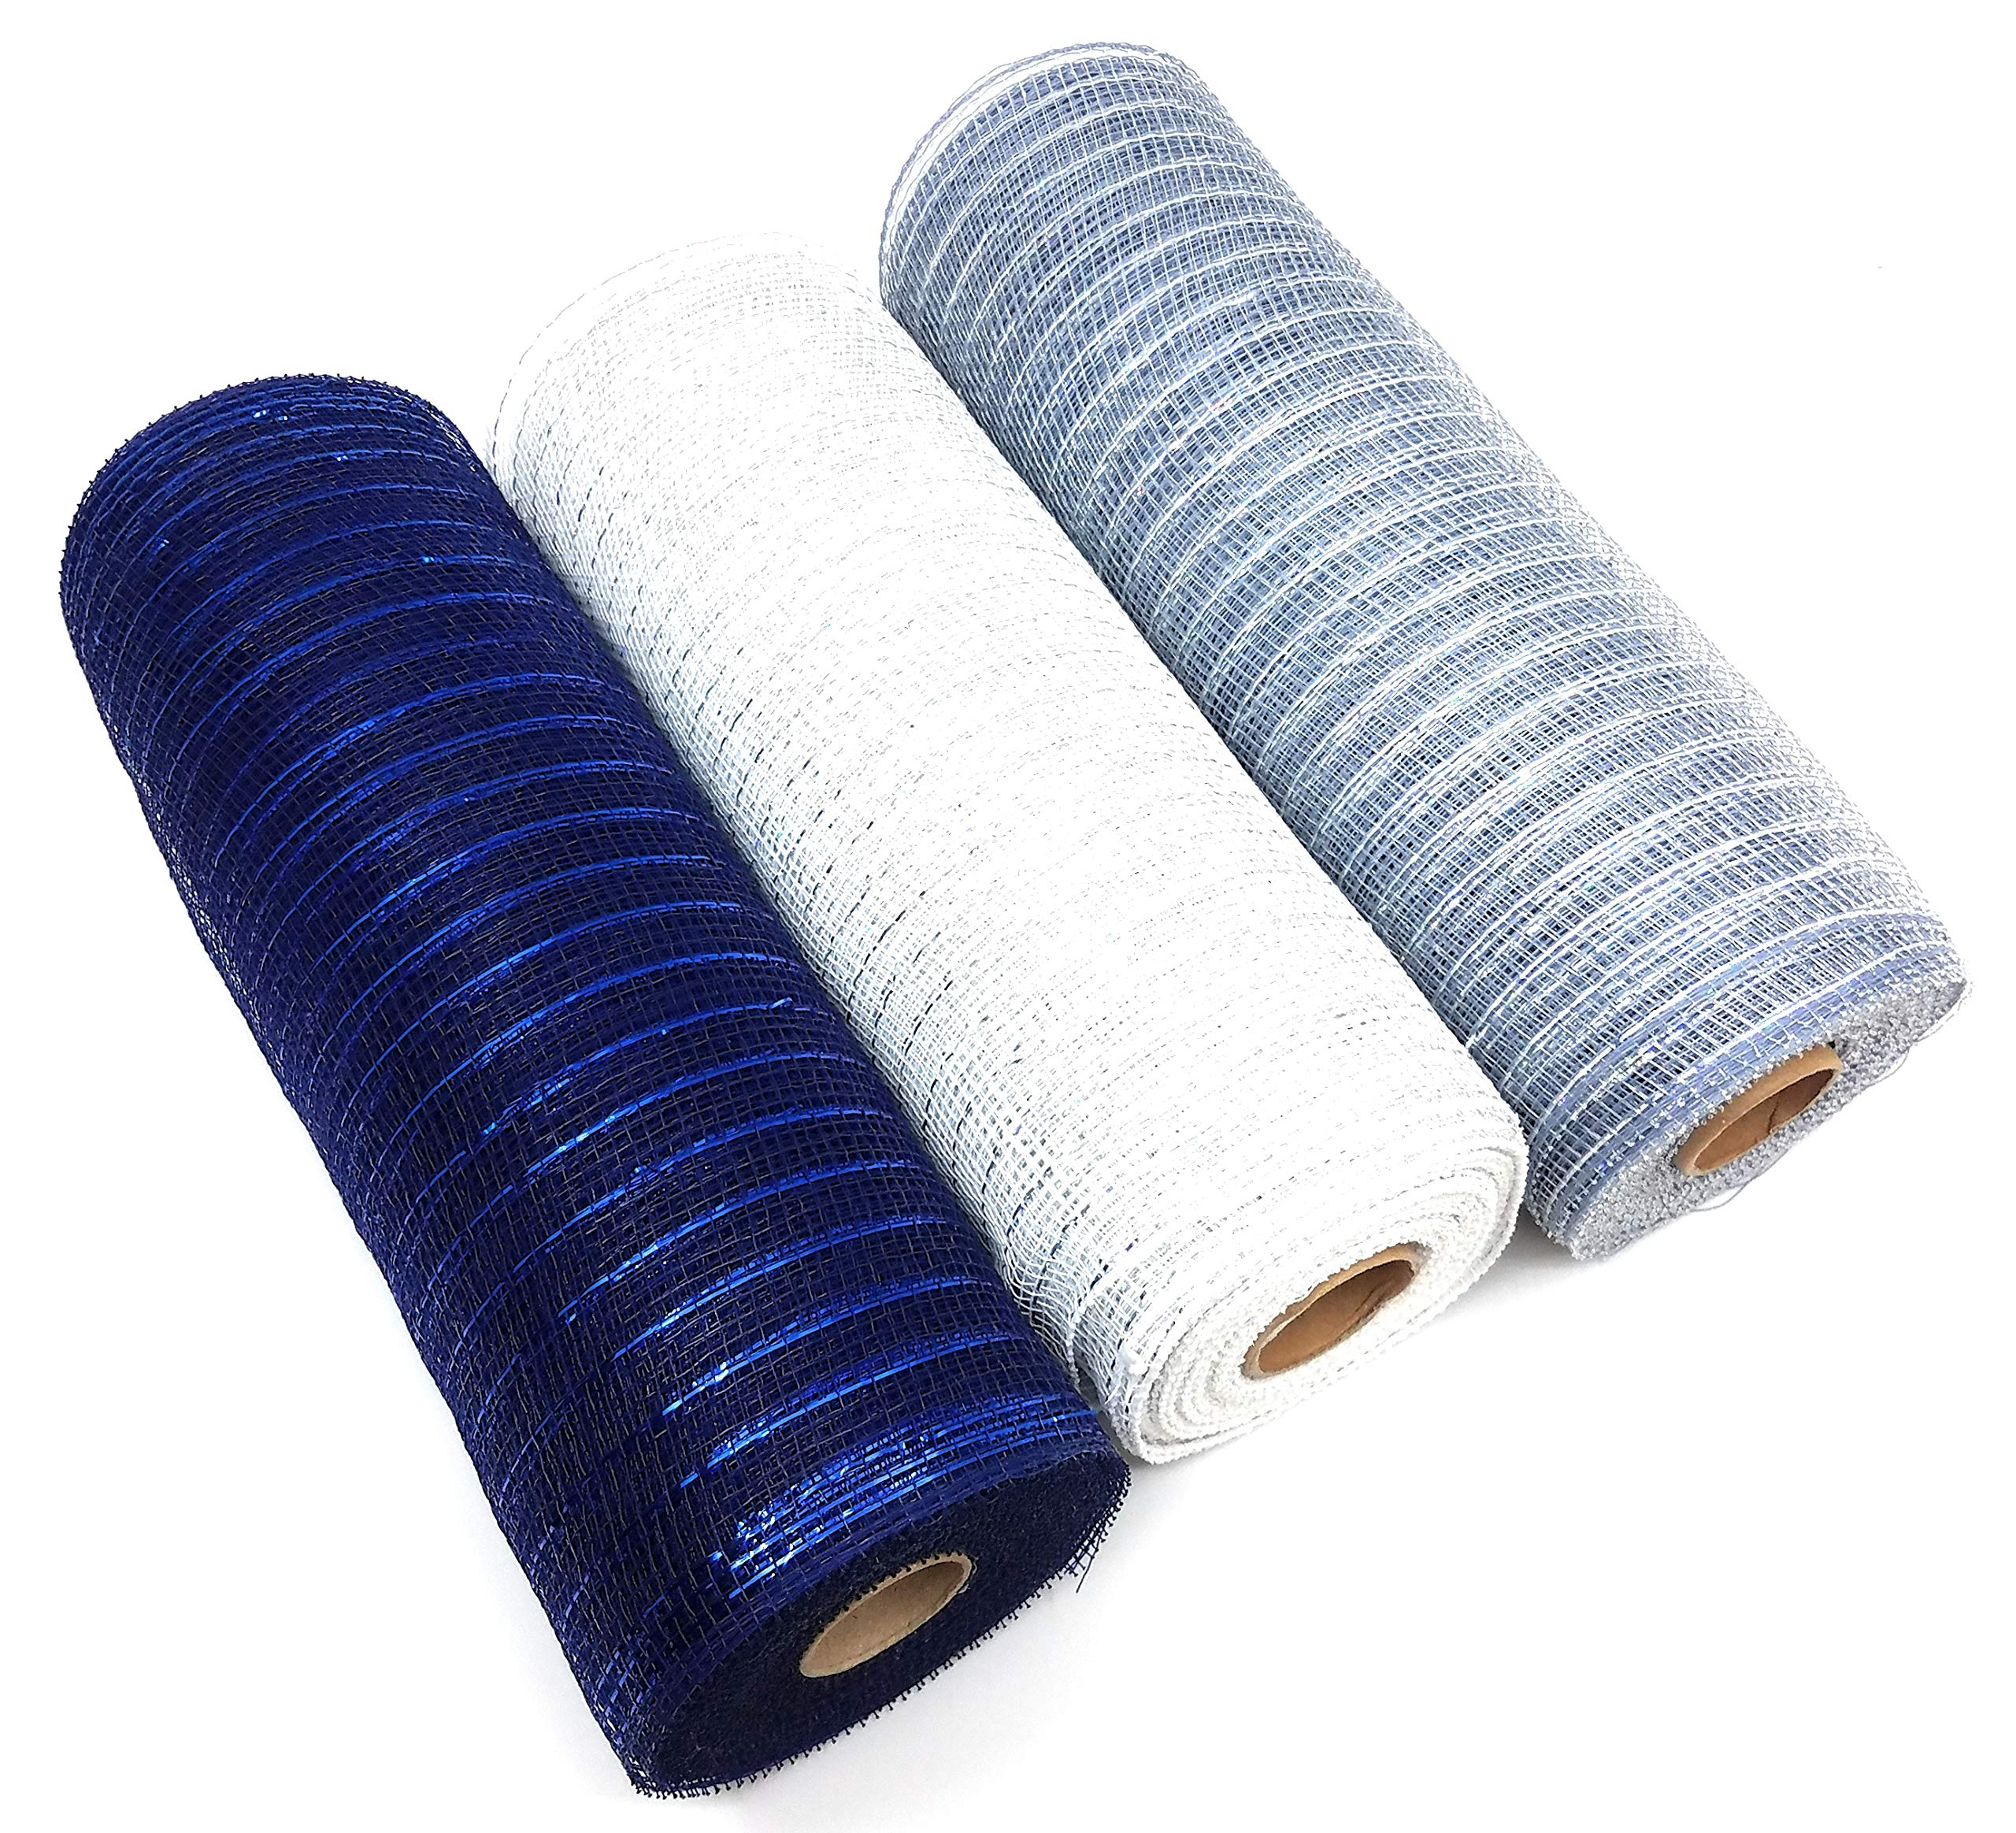 Football Themed 10'' Metallic Deco Mesh Rolls (White, Silver, Navy Blue)